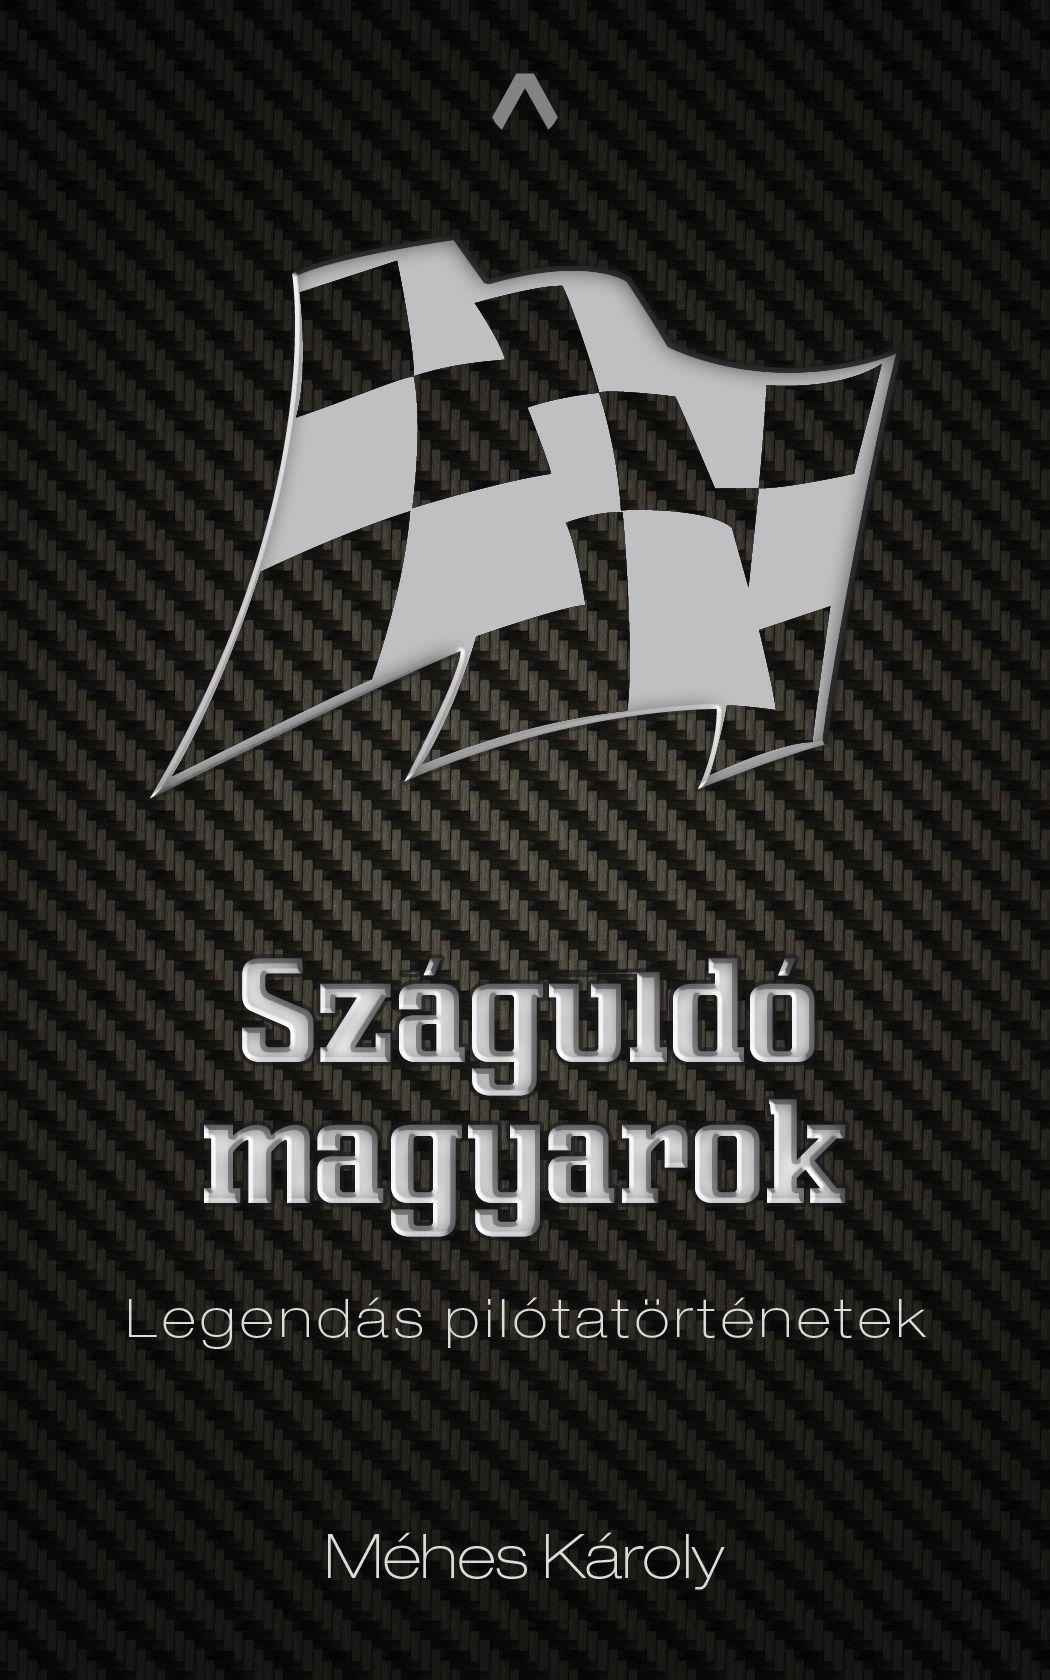 szaguldo_magyarok_rgb_vegleges